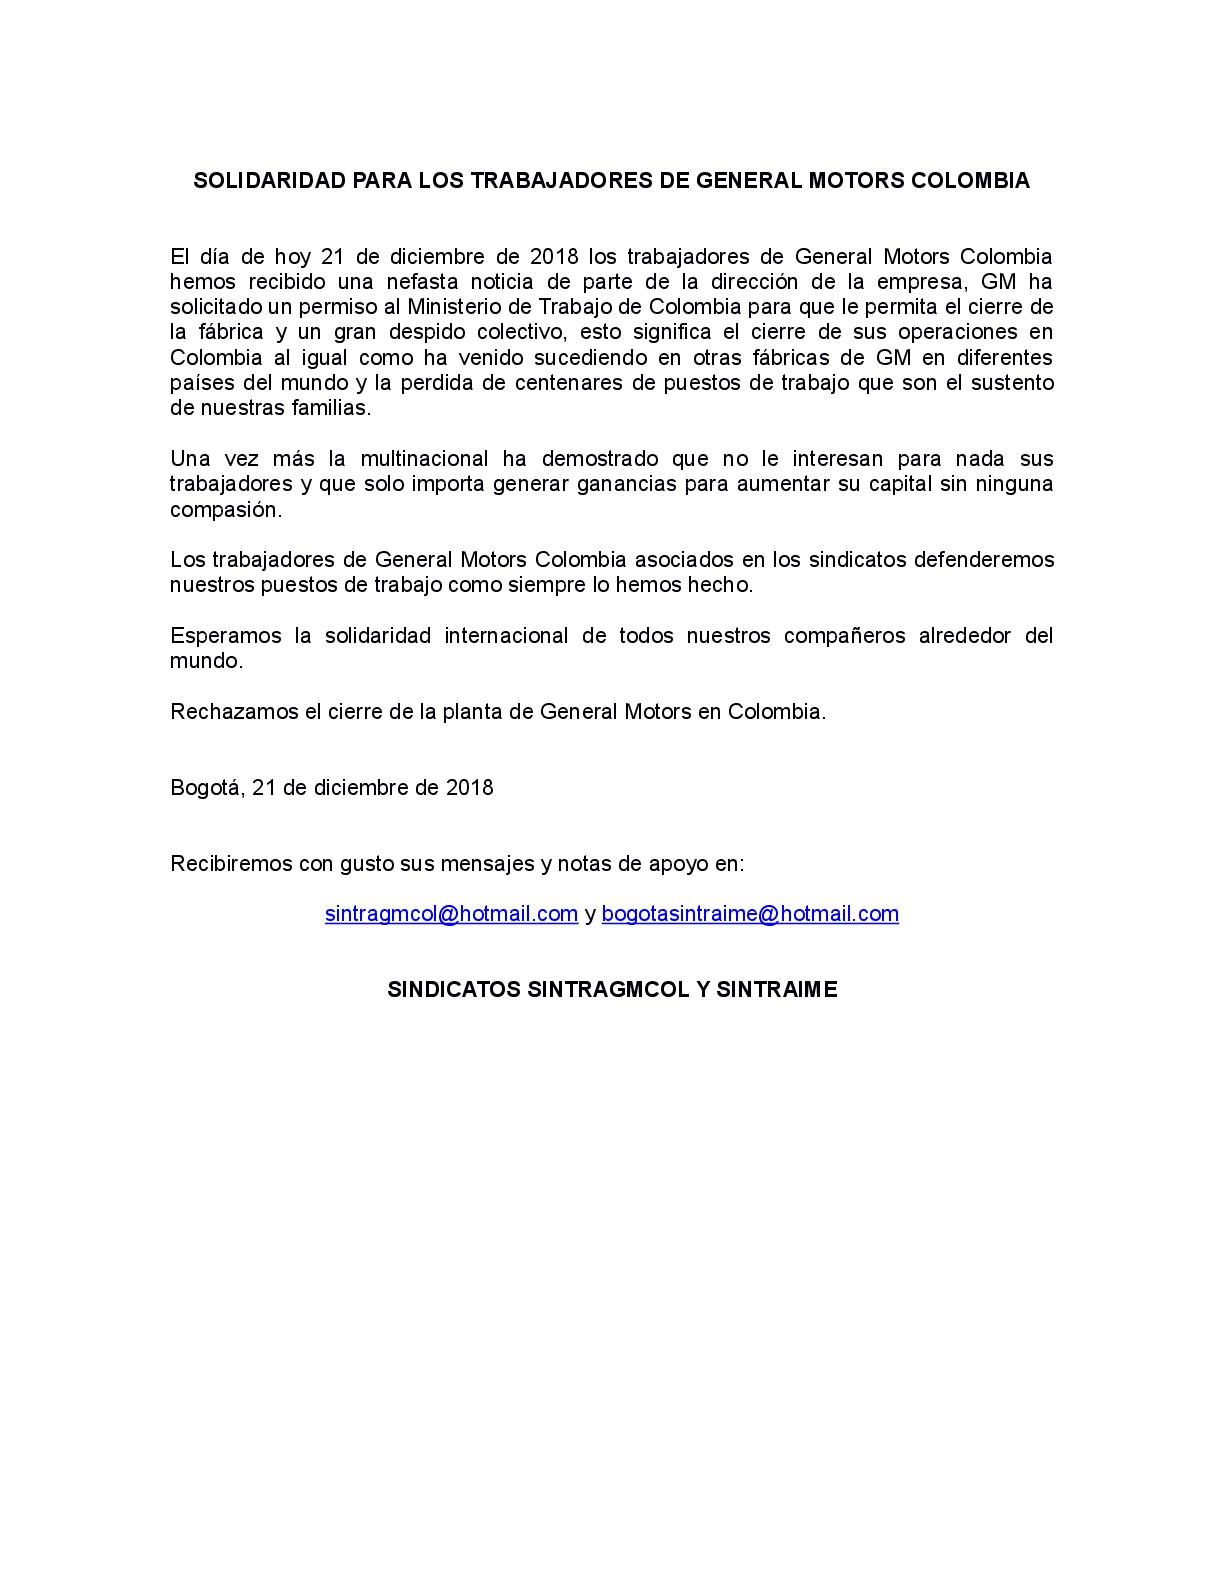 181221 GM COLOMBIA - Nota de Protesta-001